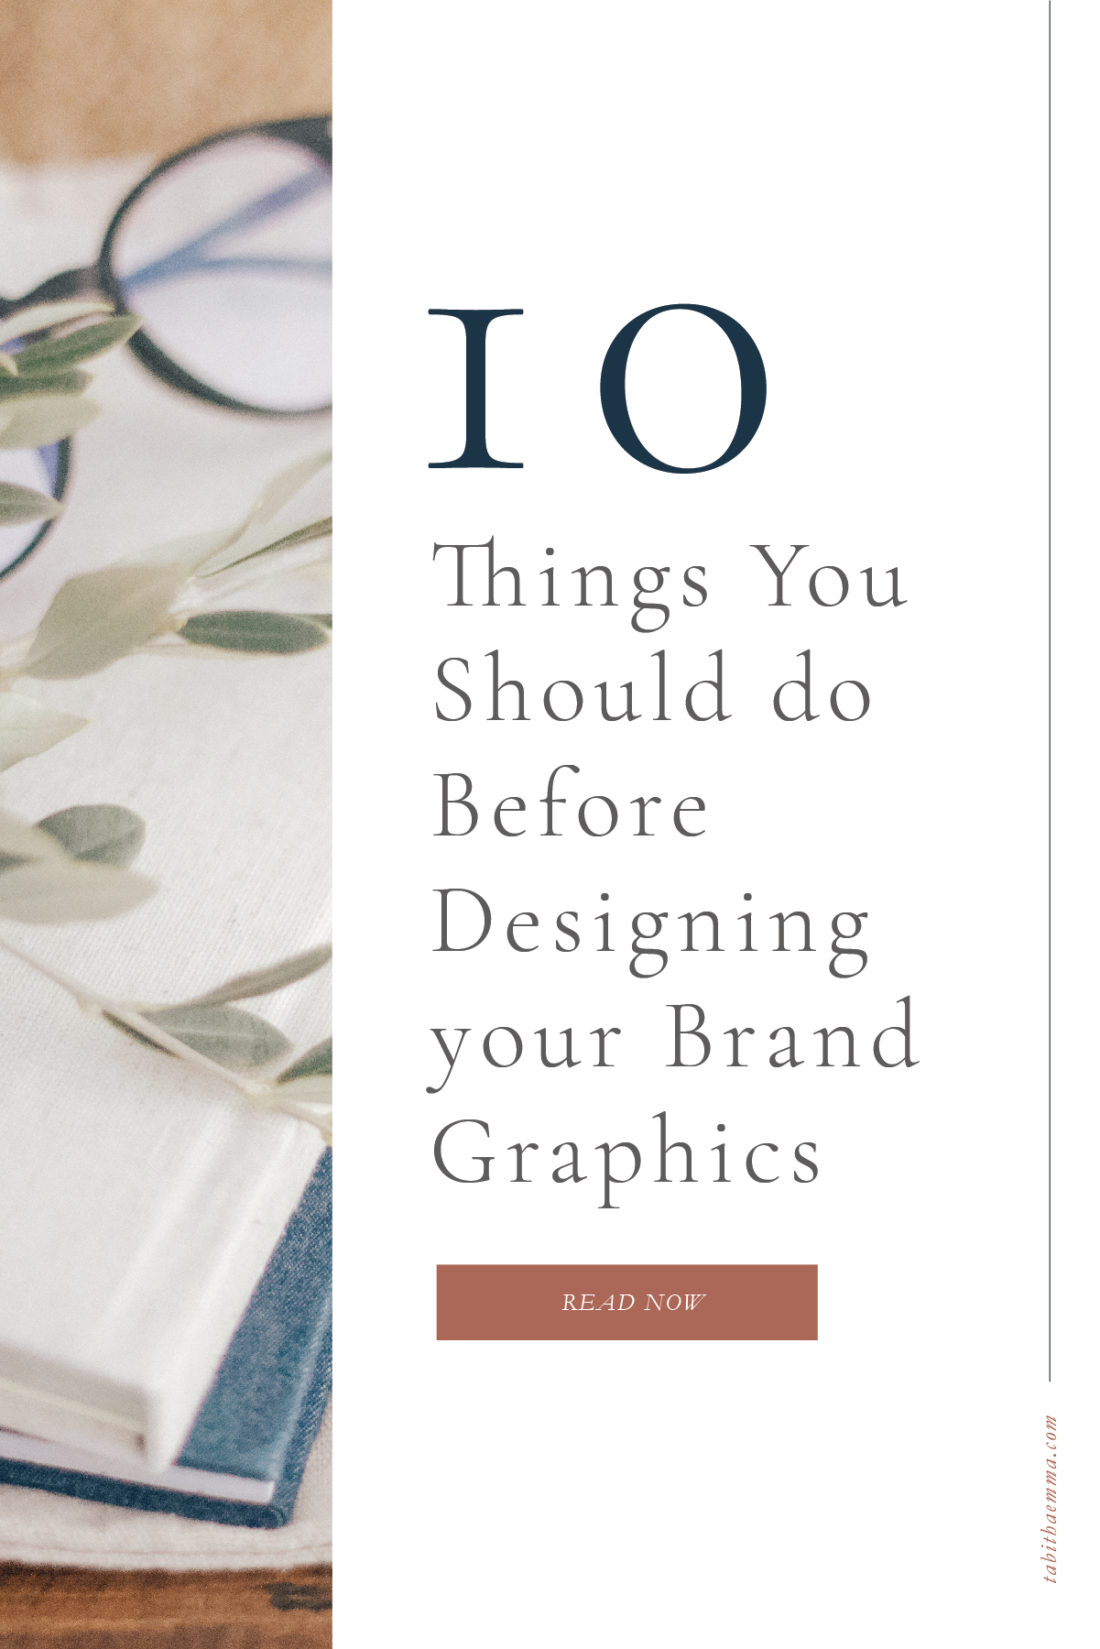 Before Designing Brand Graphics